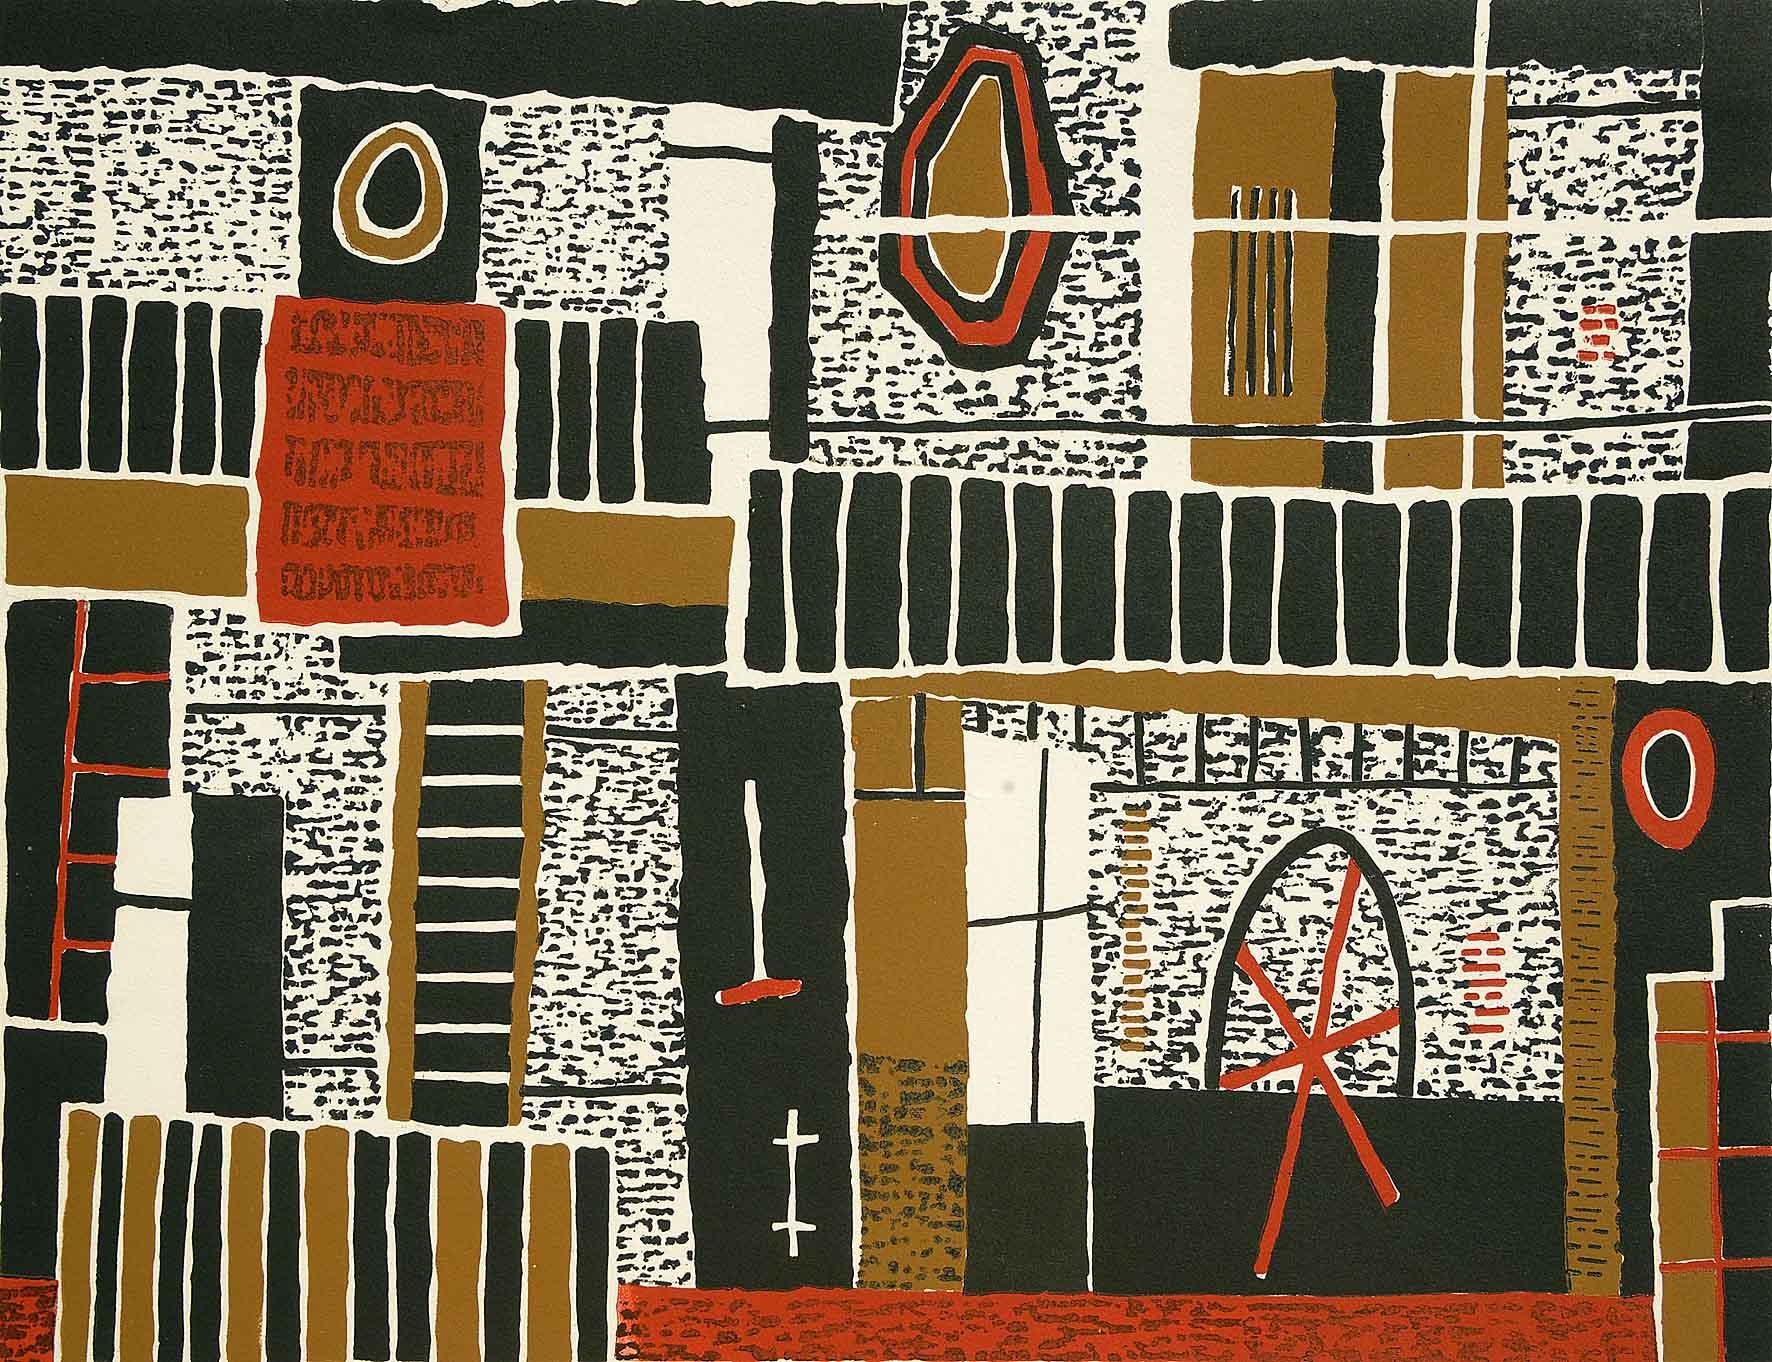 6-la-casa-del-fabbro-1957-xilogr